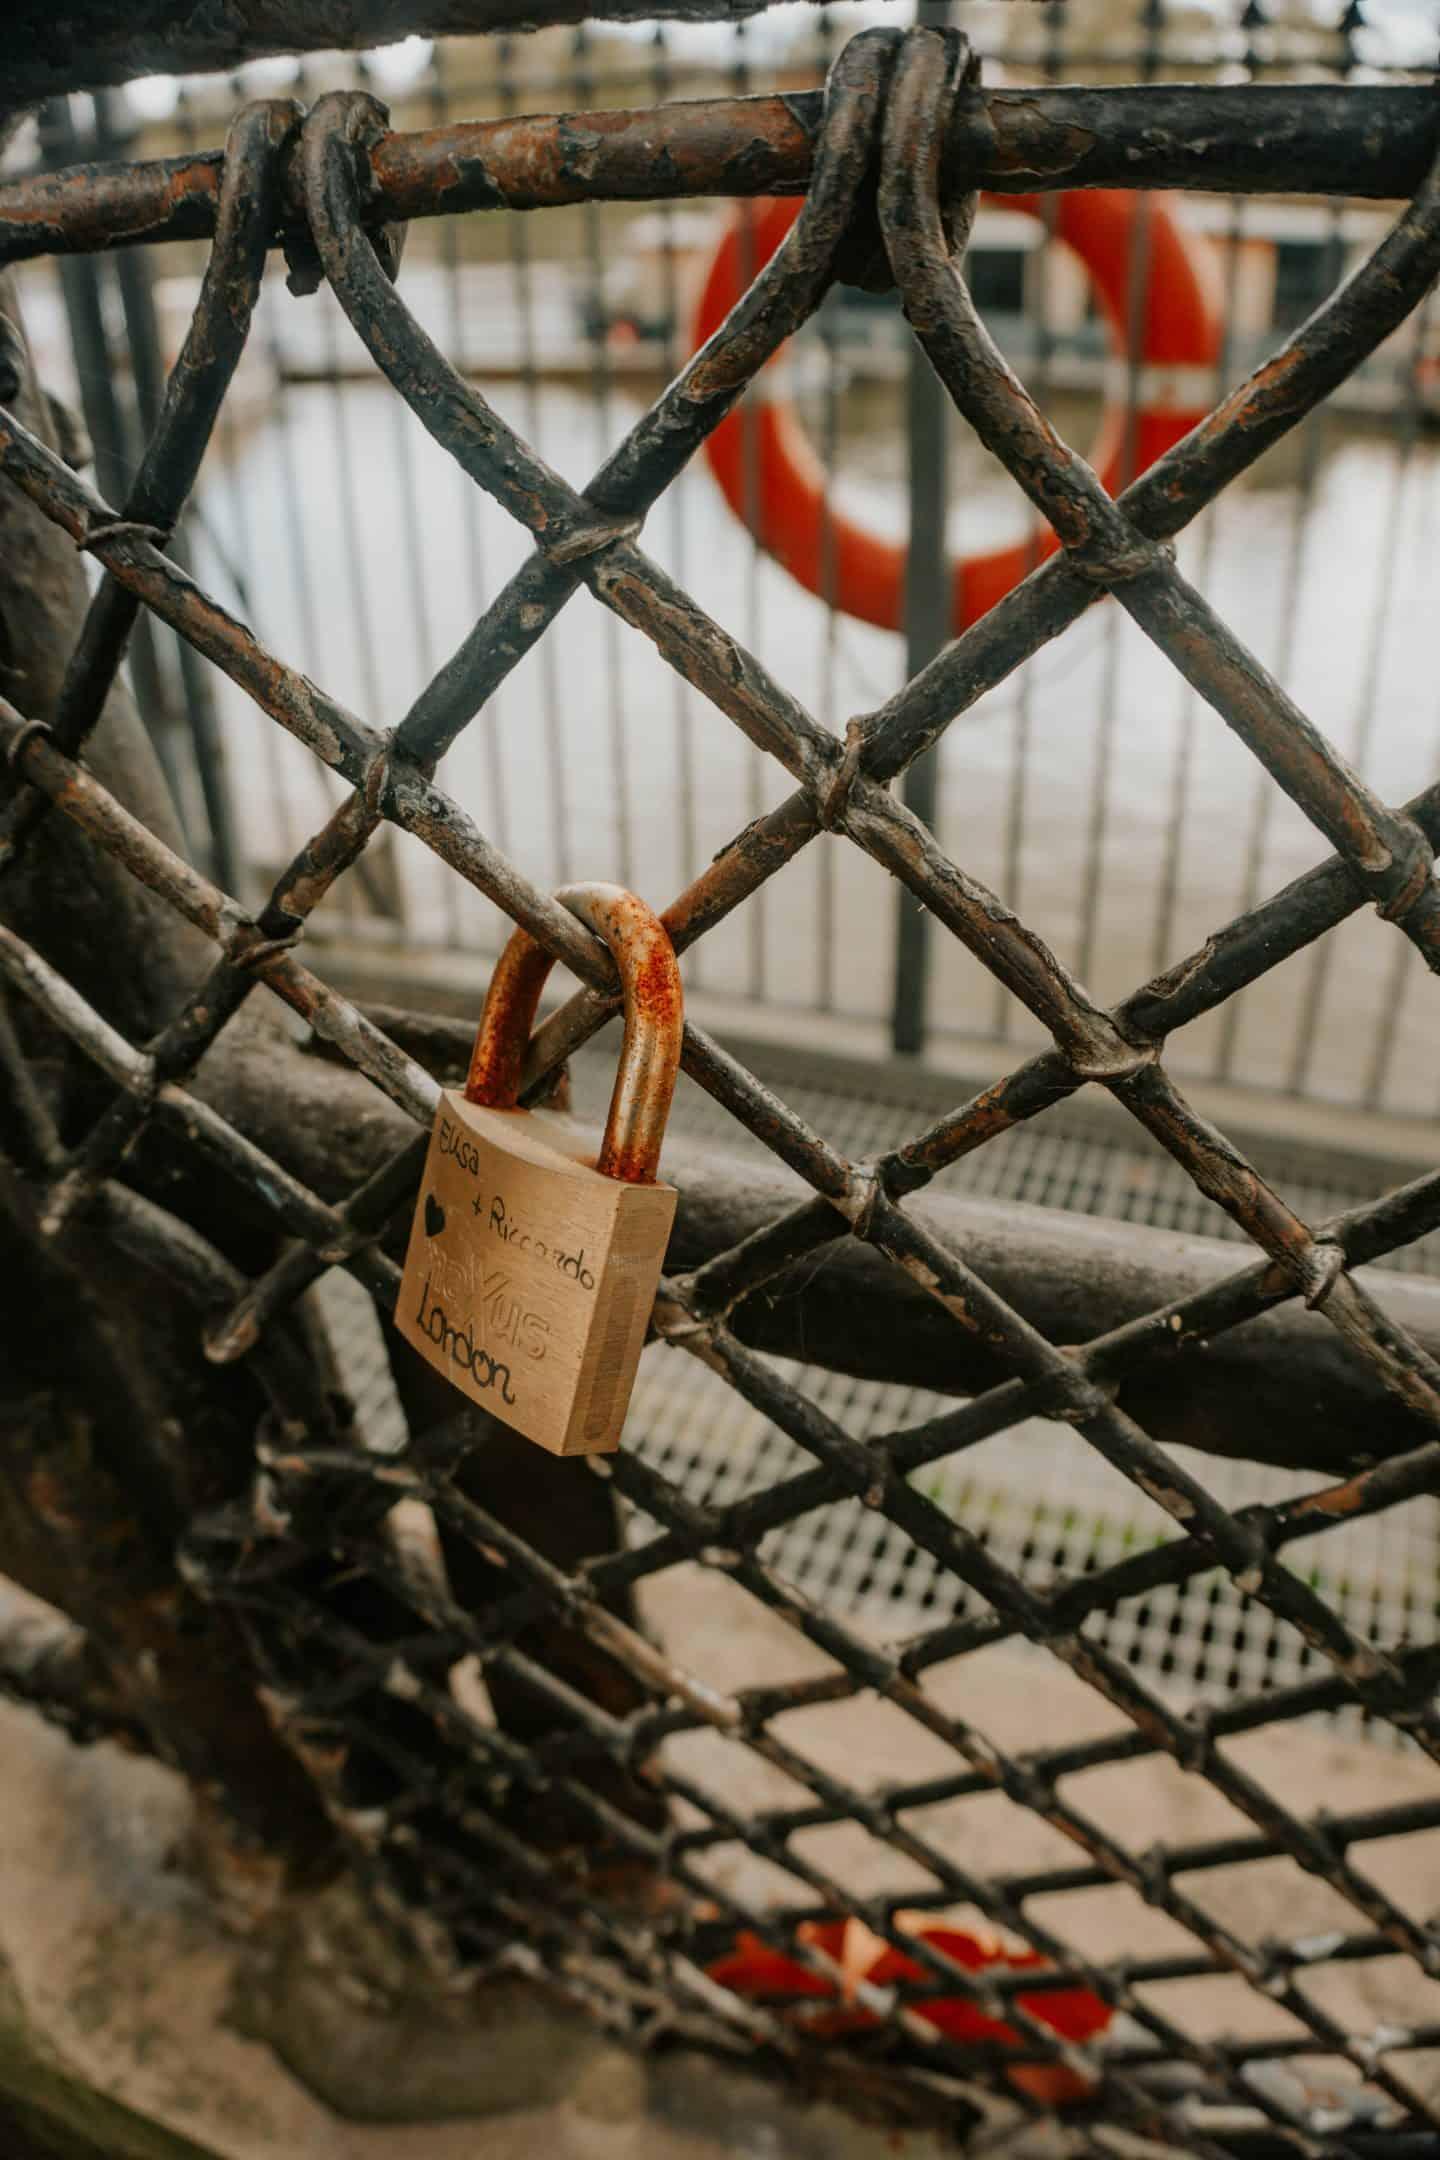 Locks at Chelsea Embankment